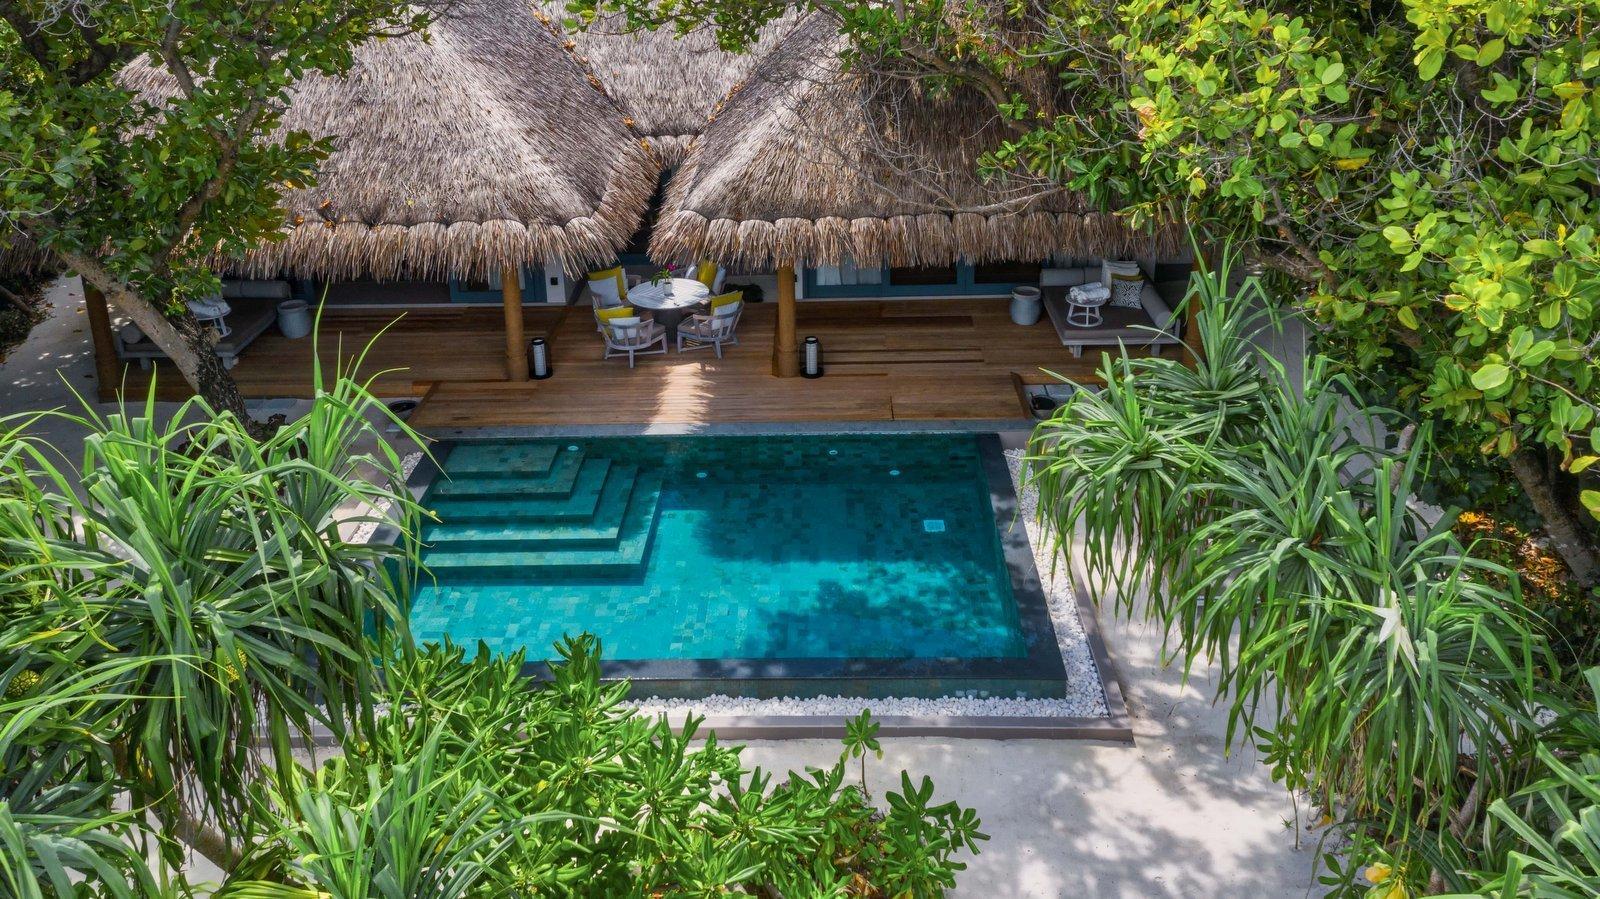 Мальдивы, отель Vakkaru Maldives, номер Two Bed Room Beach Pool Residence